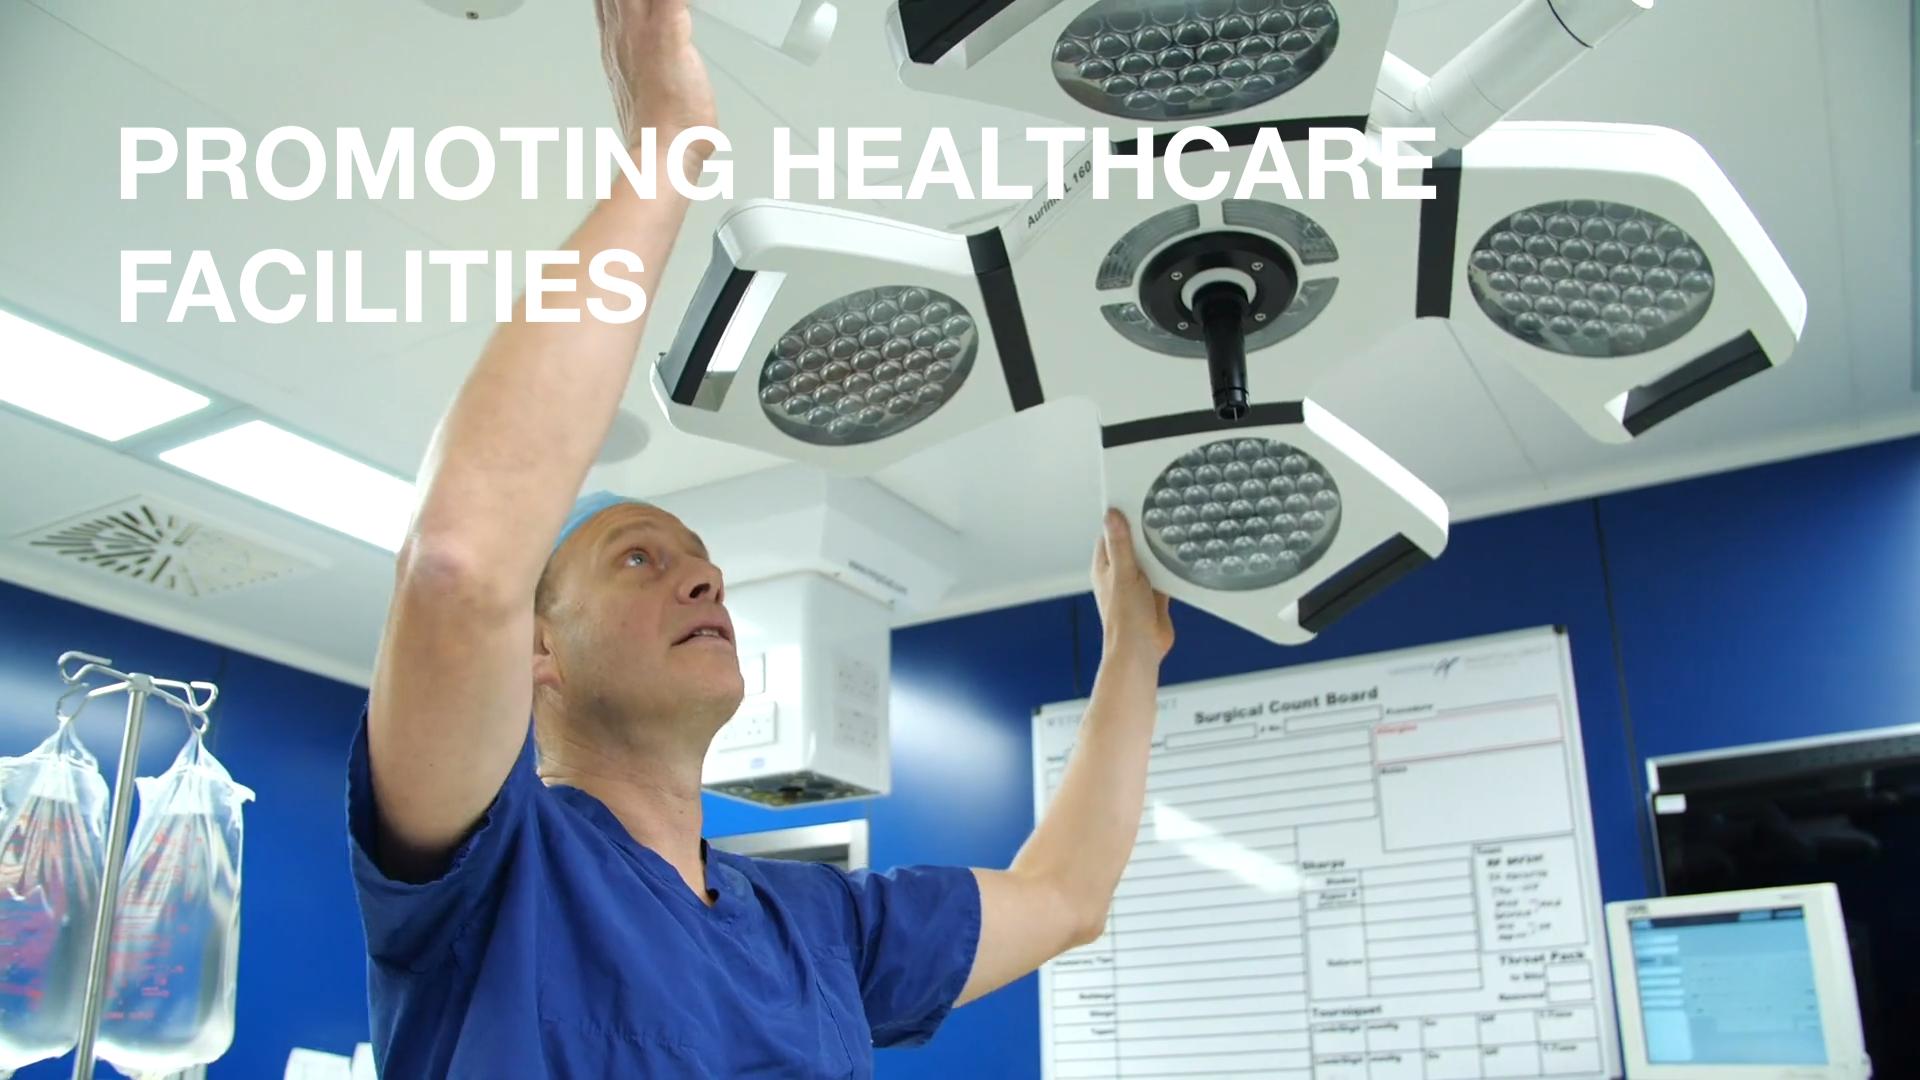 Promoting Healthcare Facilities